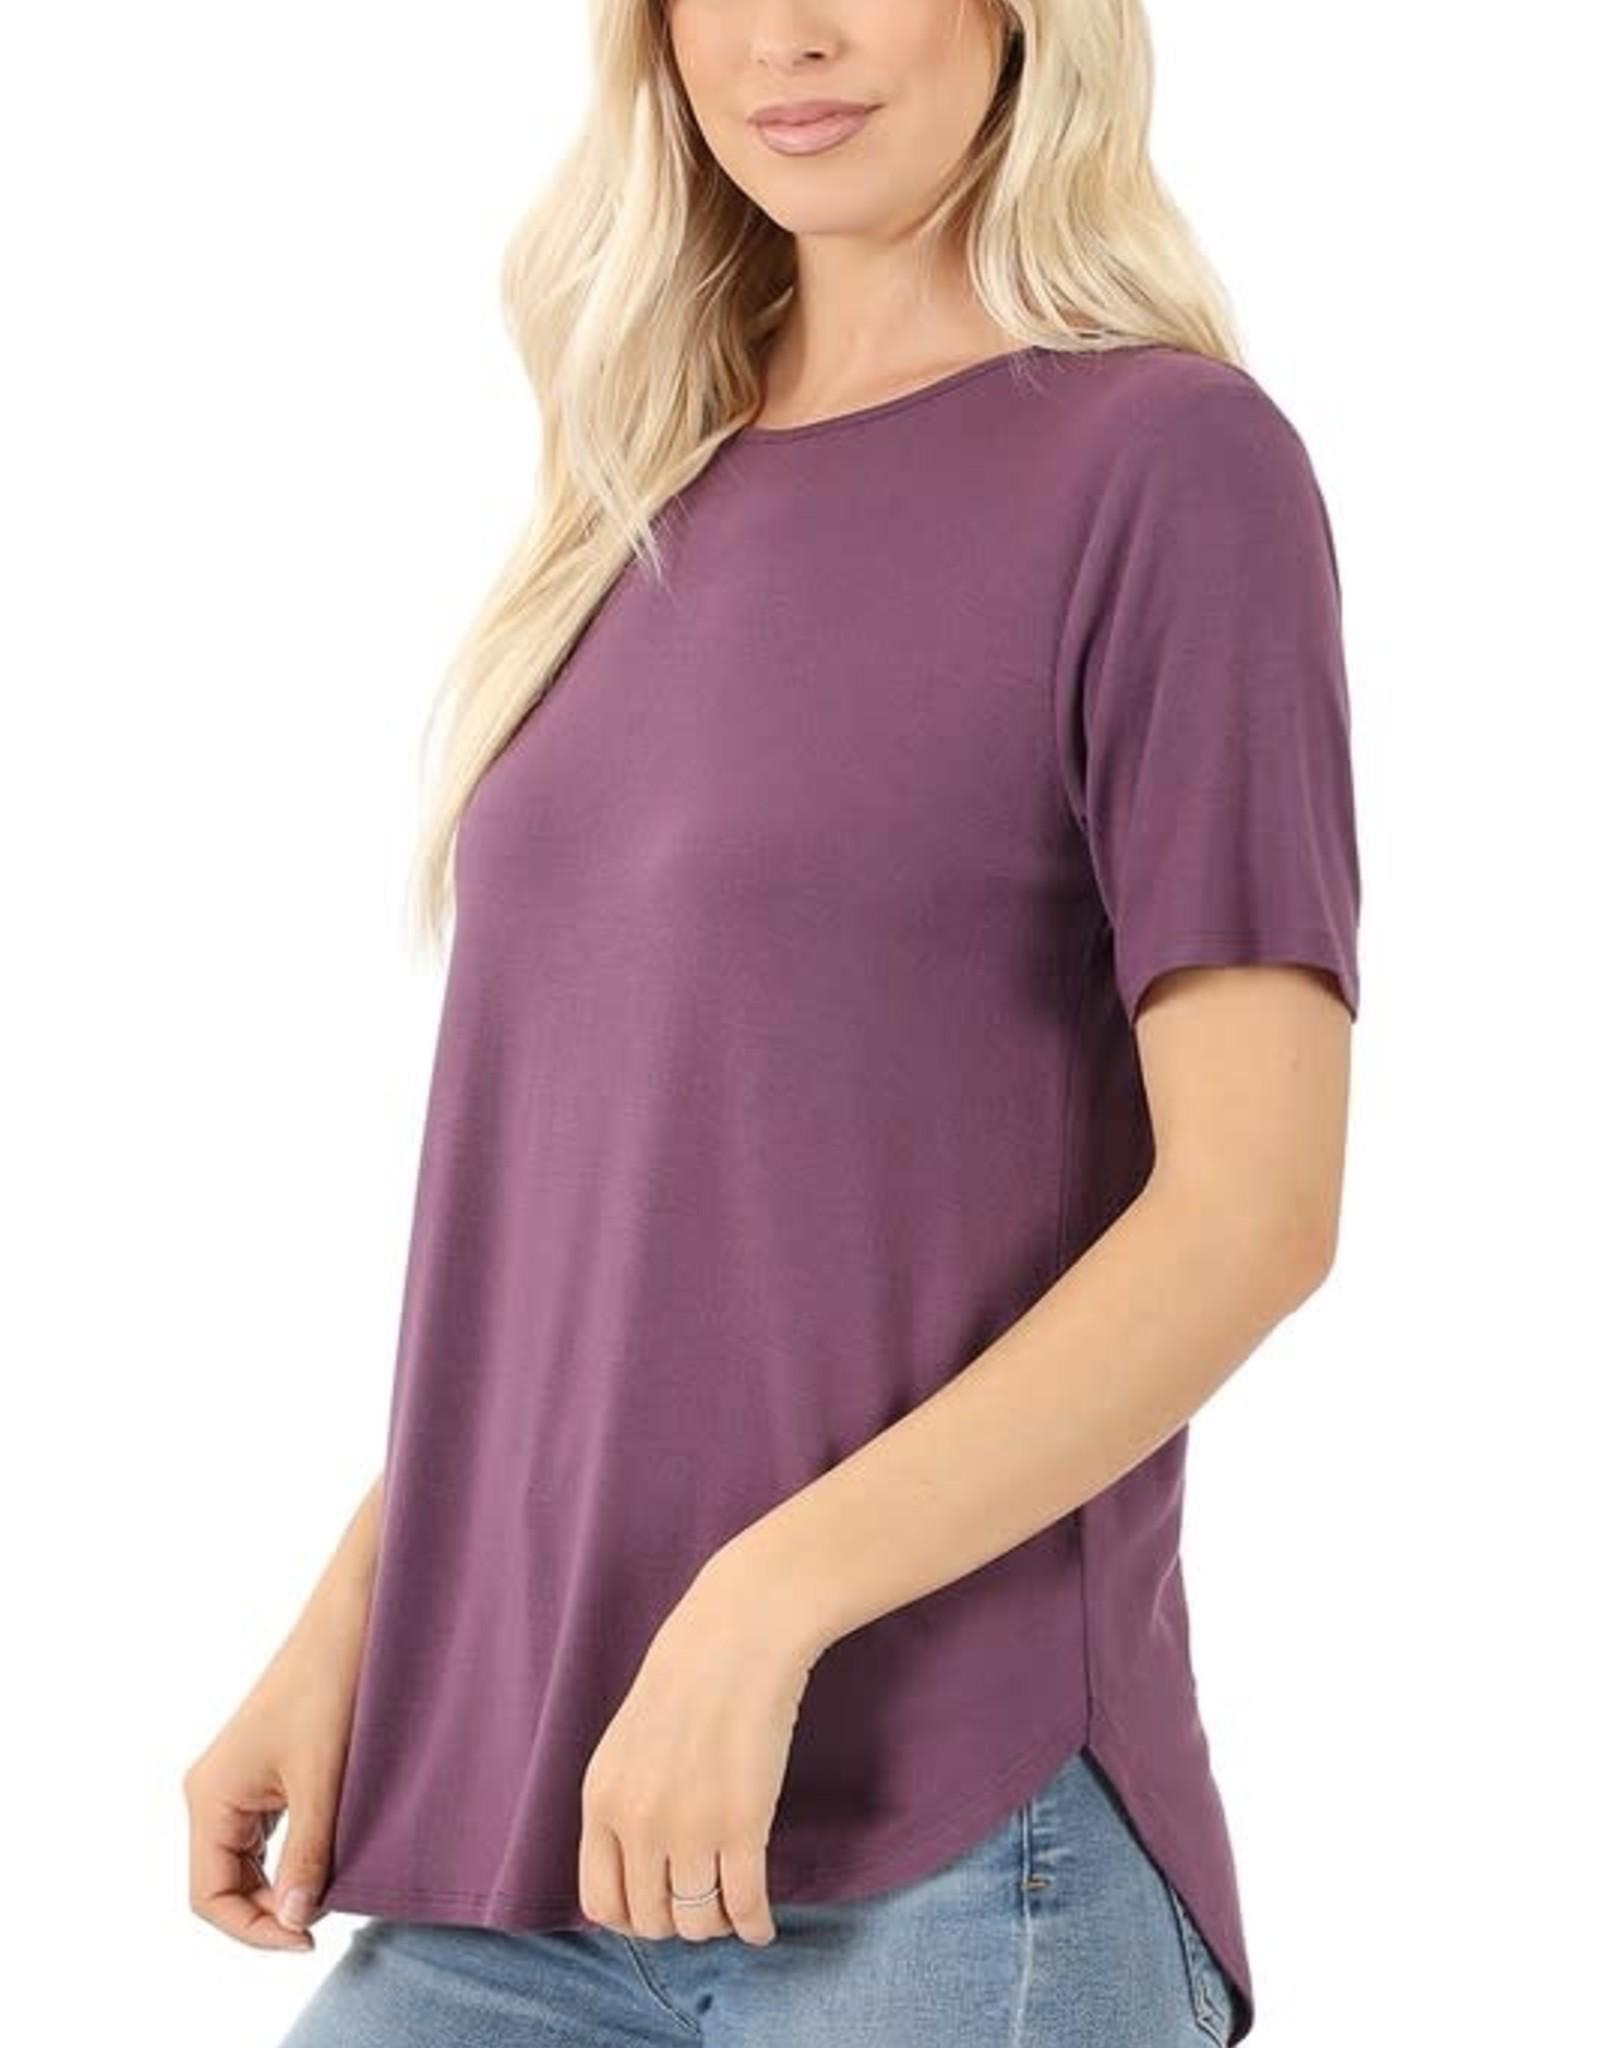 - Eggplant Roundneck Short Sleeve Top w/Hi-Low Hem